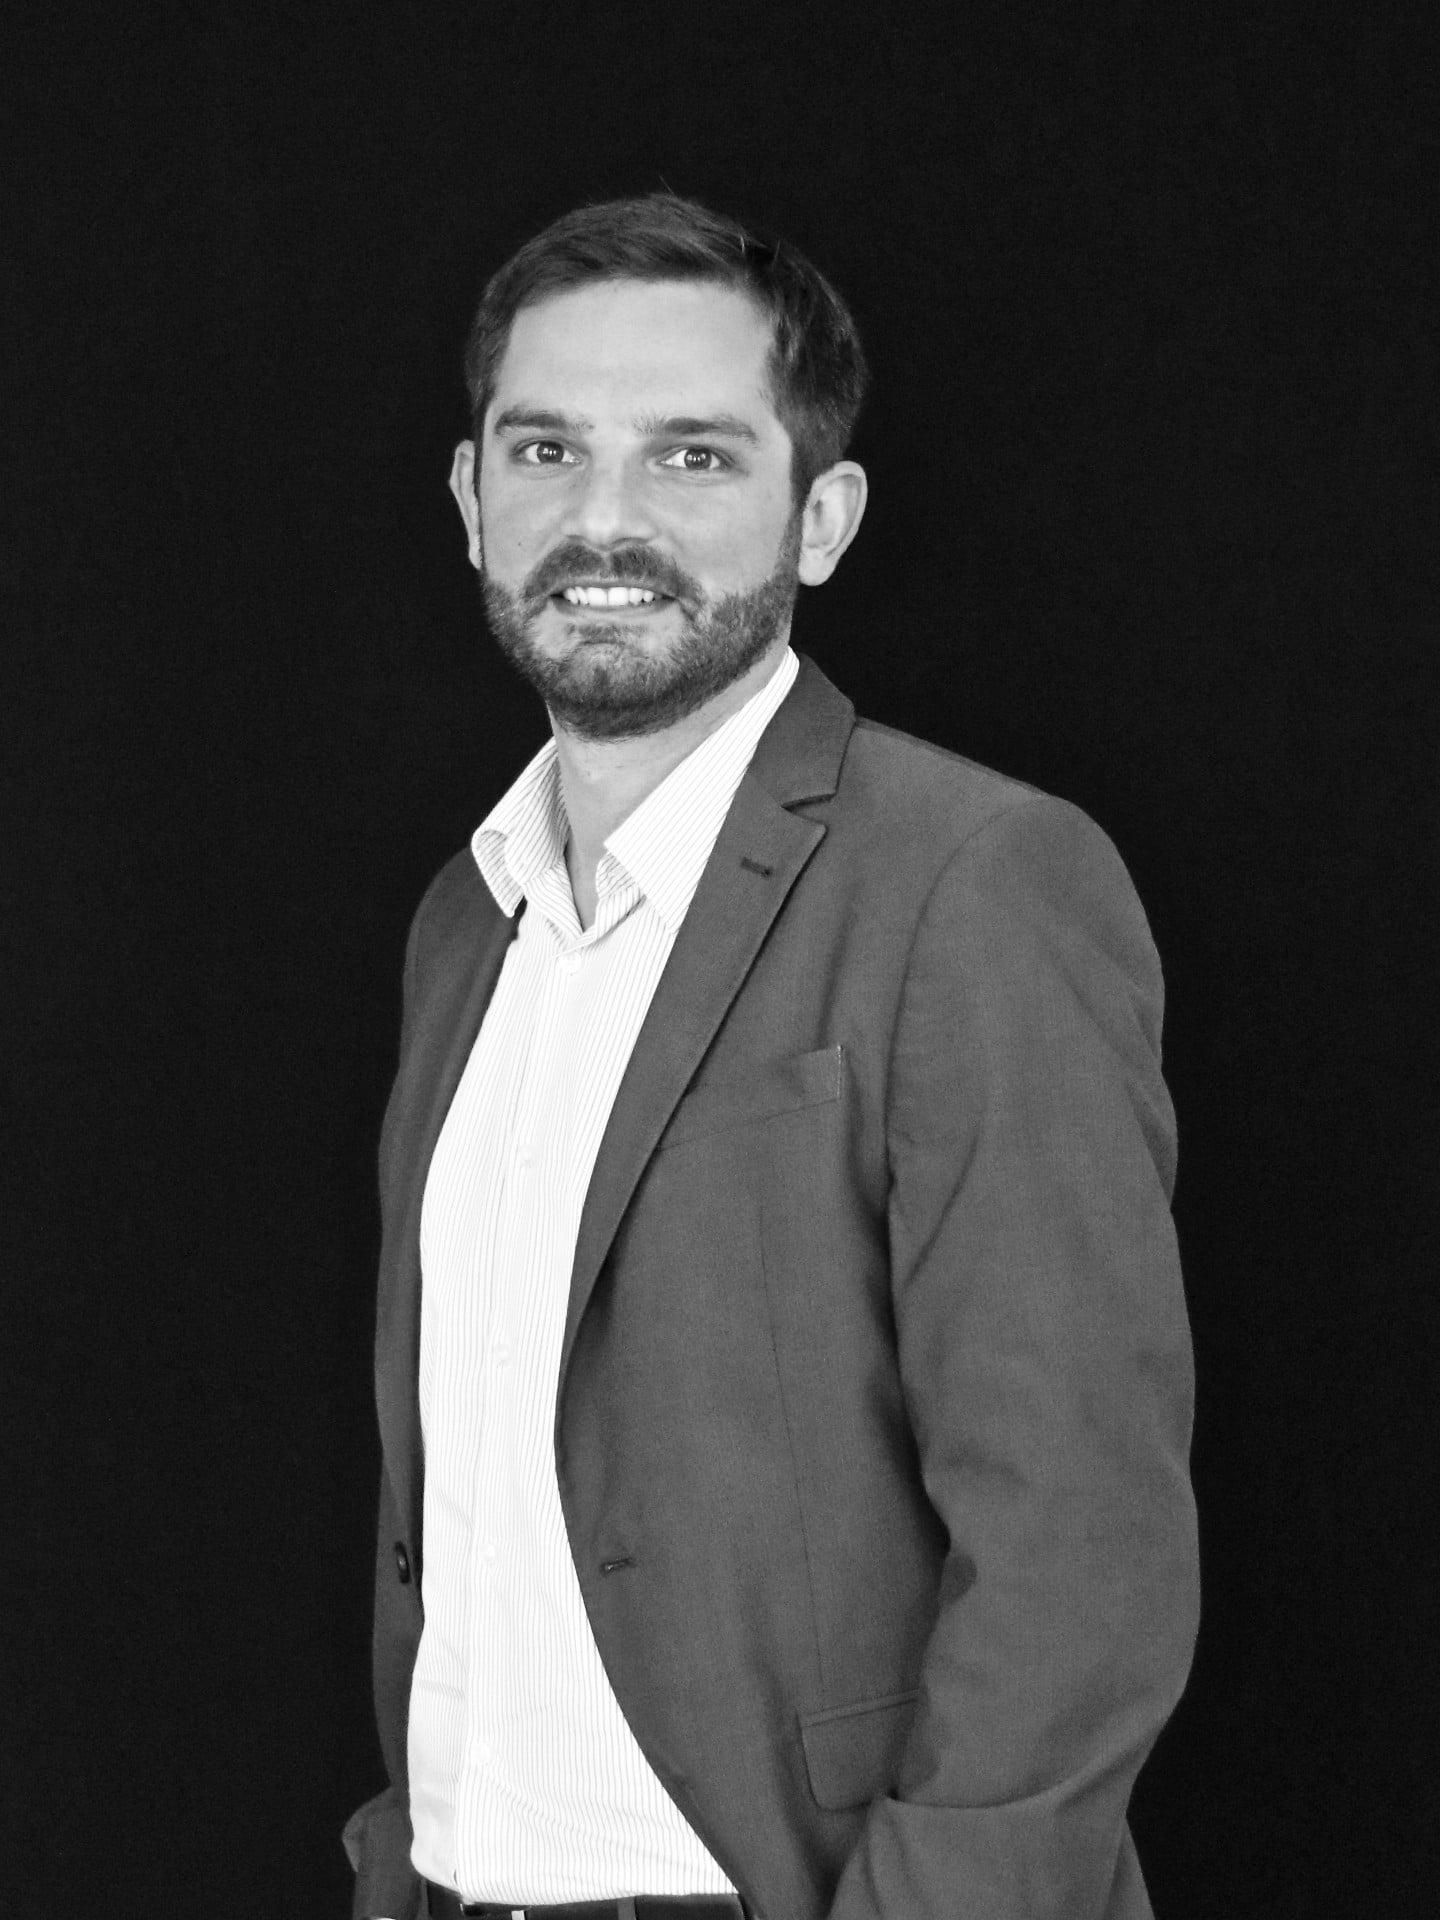 Gonzalo De La Cuadra, Regional Manager for LATAM